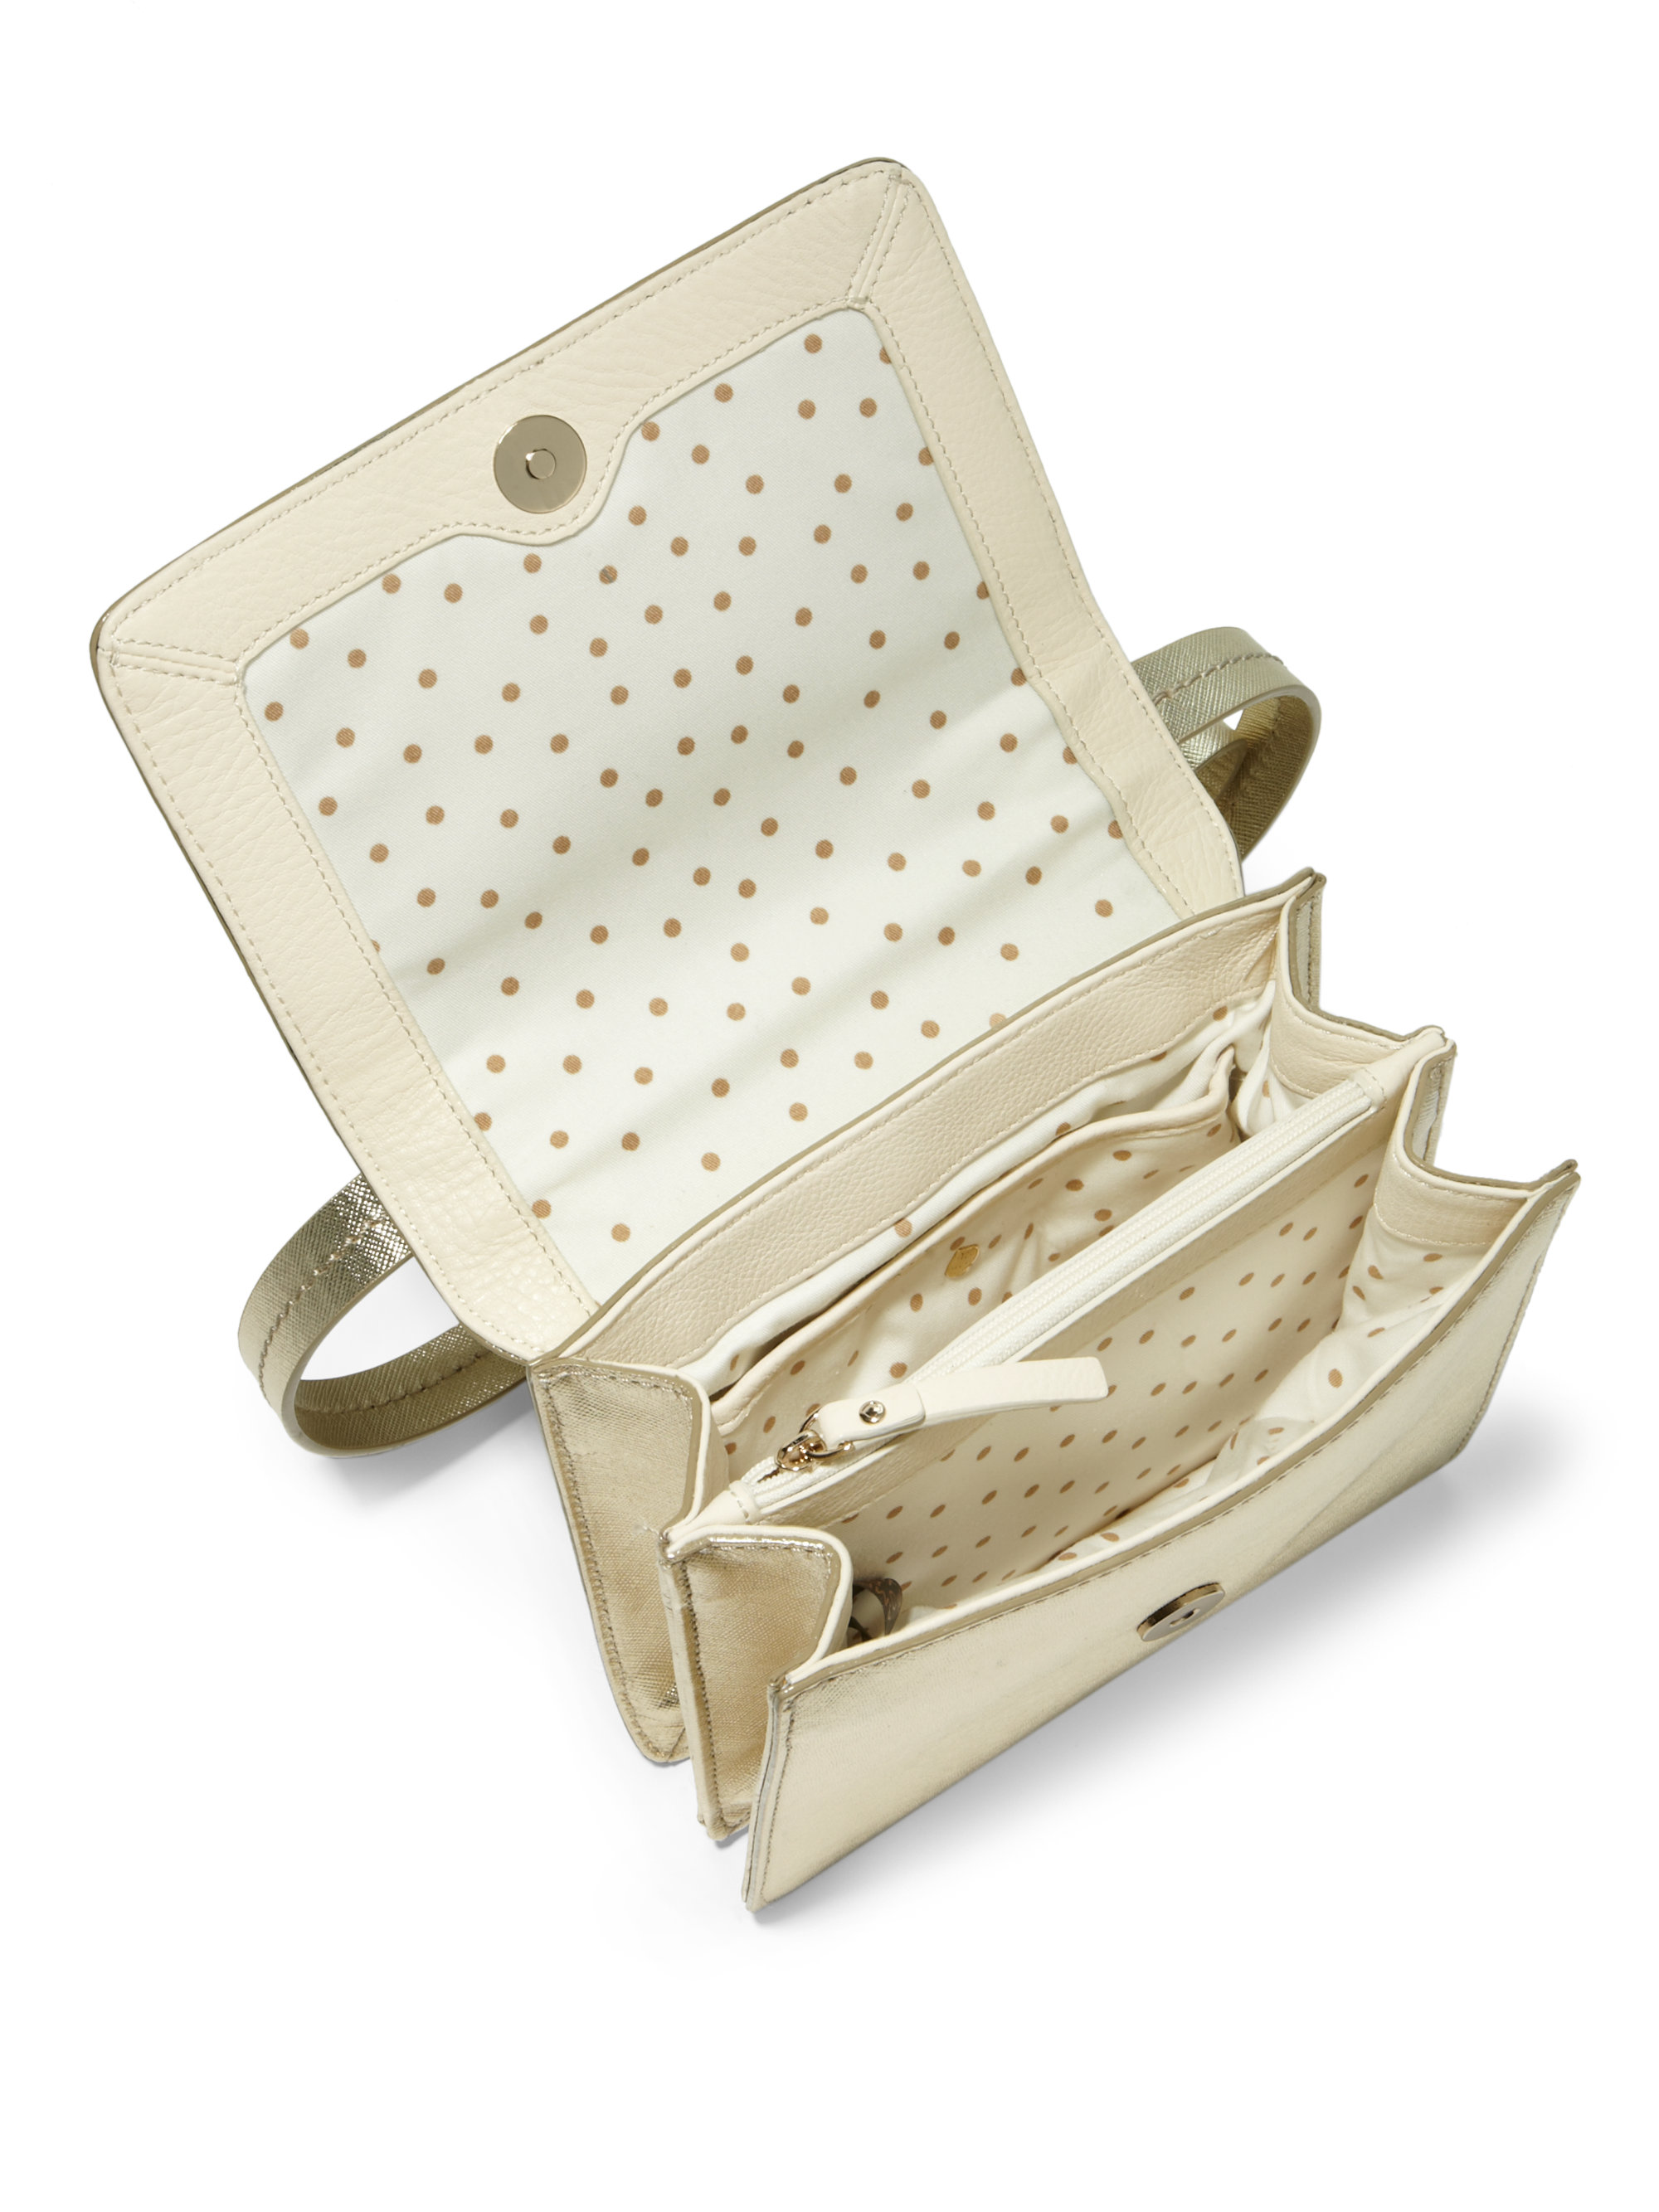 cde0aef8f1ee Lyst - Kate Spade Niconico Metallic Leather Crossbody Bag in Metallic